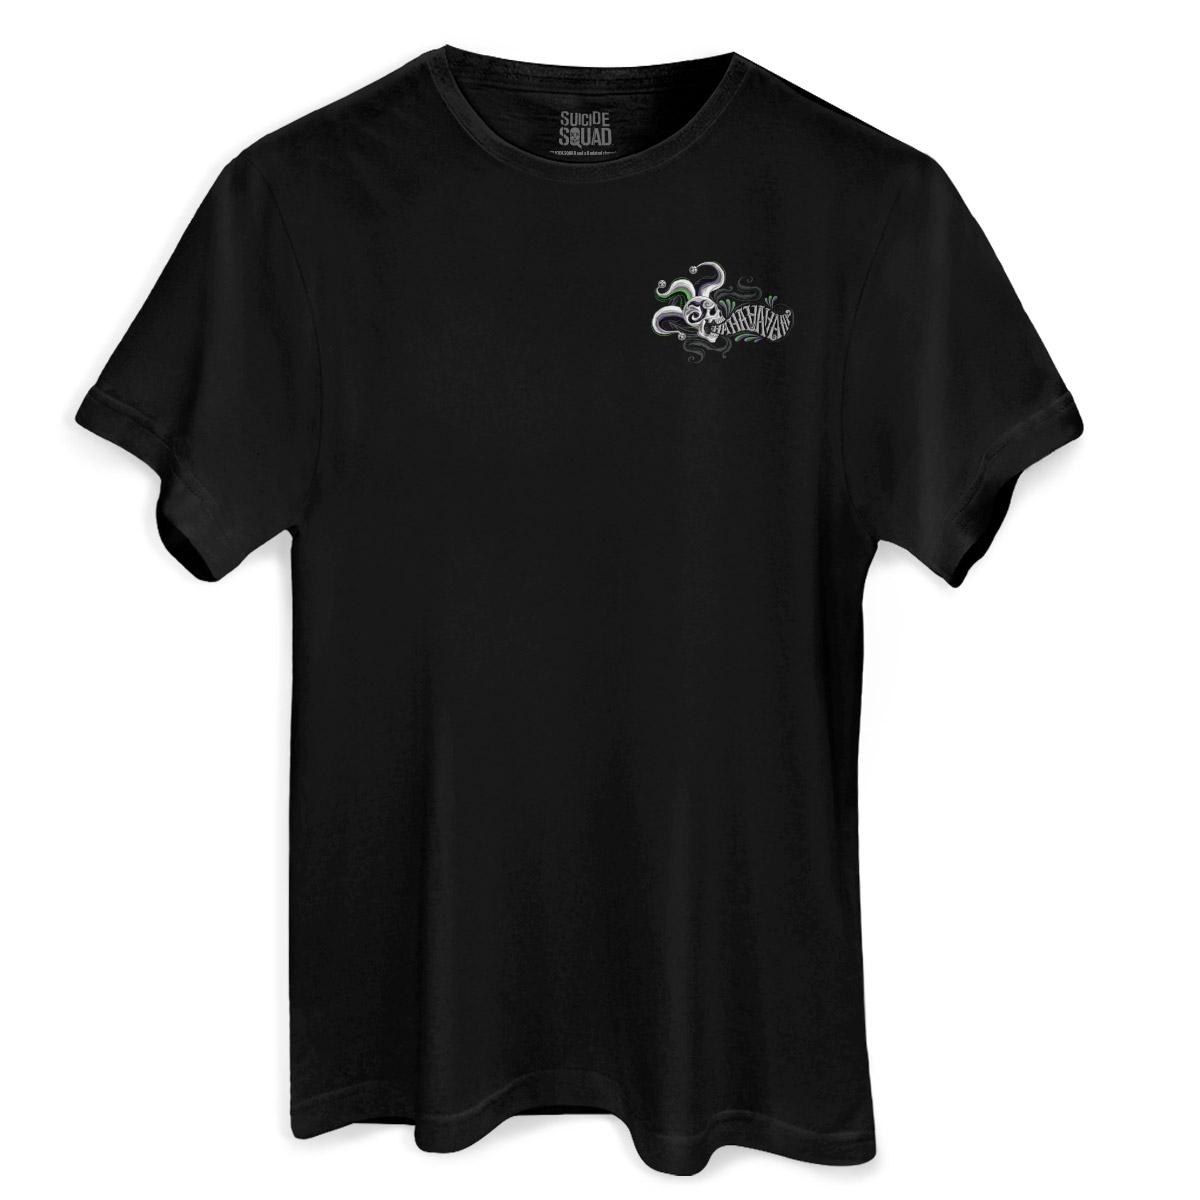 Camiseta Masculina Esquadrão Suicida You´re Killing Me  - bandUP Store Marketplace